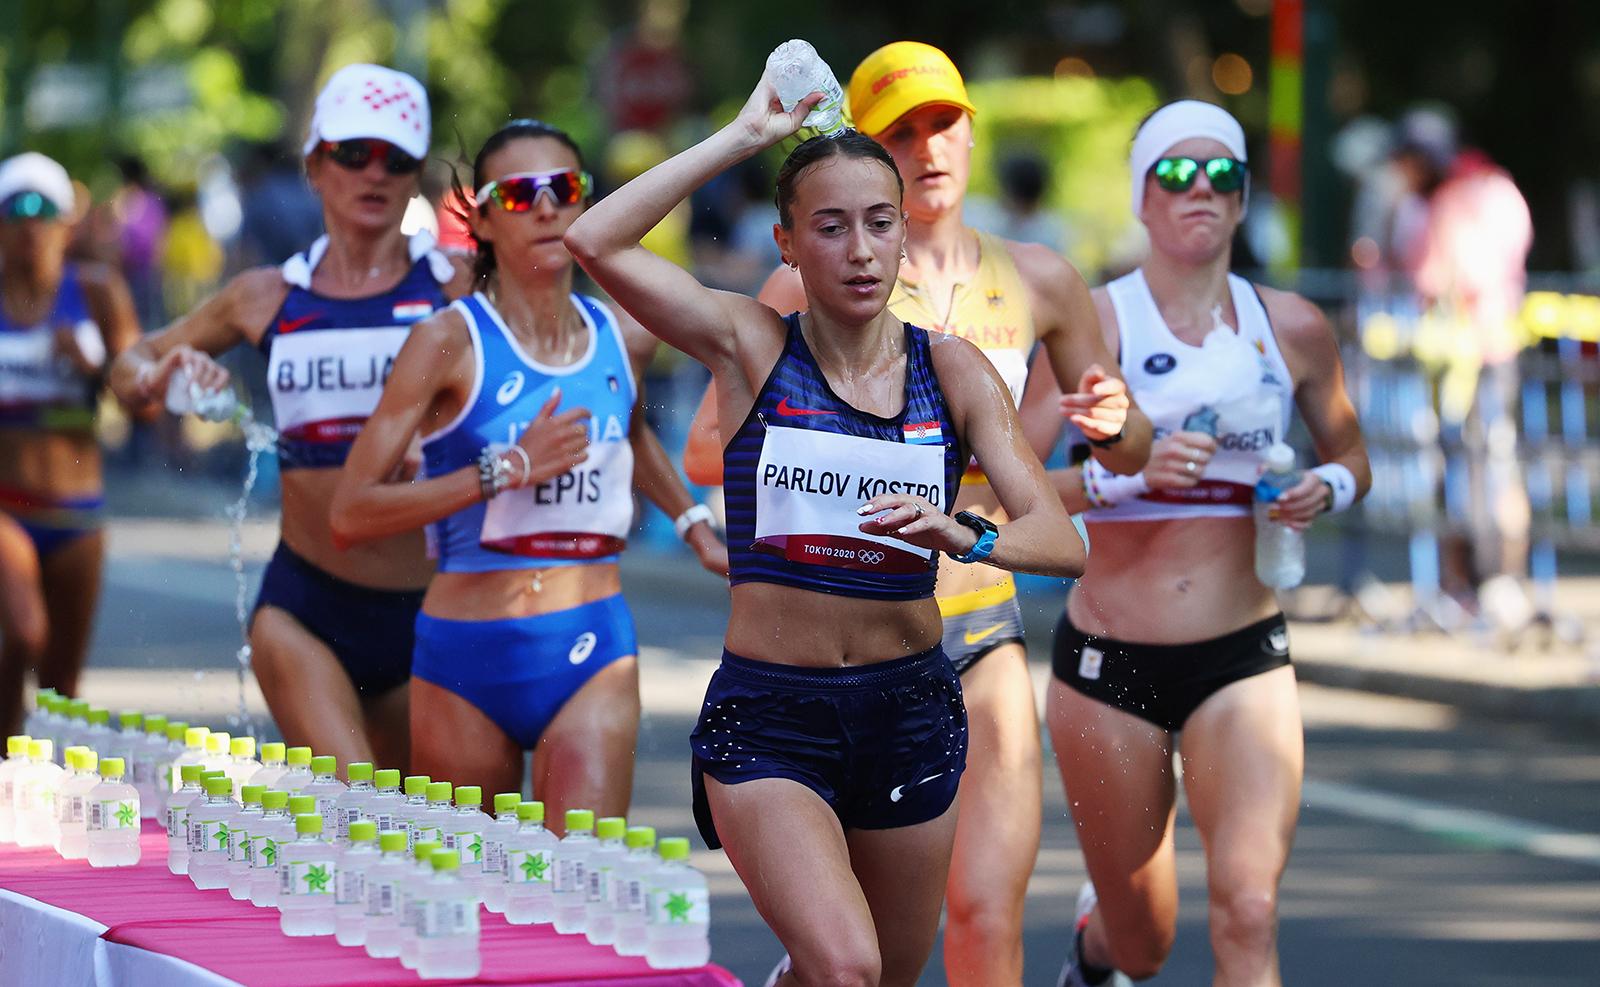 Tokyo 2020 Olympics - Athletics - Women's Marathon - Sapporo Odori Park, Sapporo, Japan - August 7, 2021. Matea Parlov Kostro of Croatia in action. REUTERS